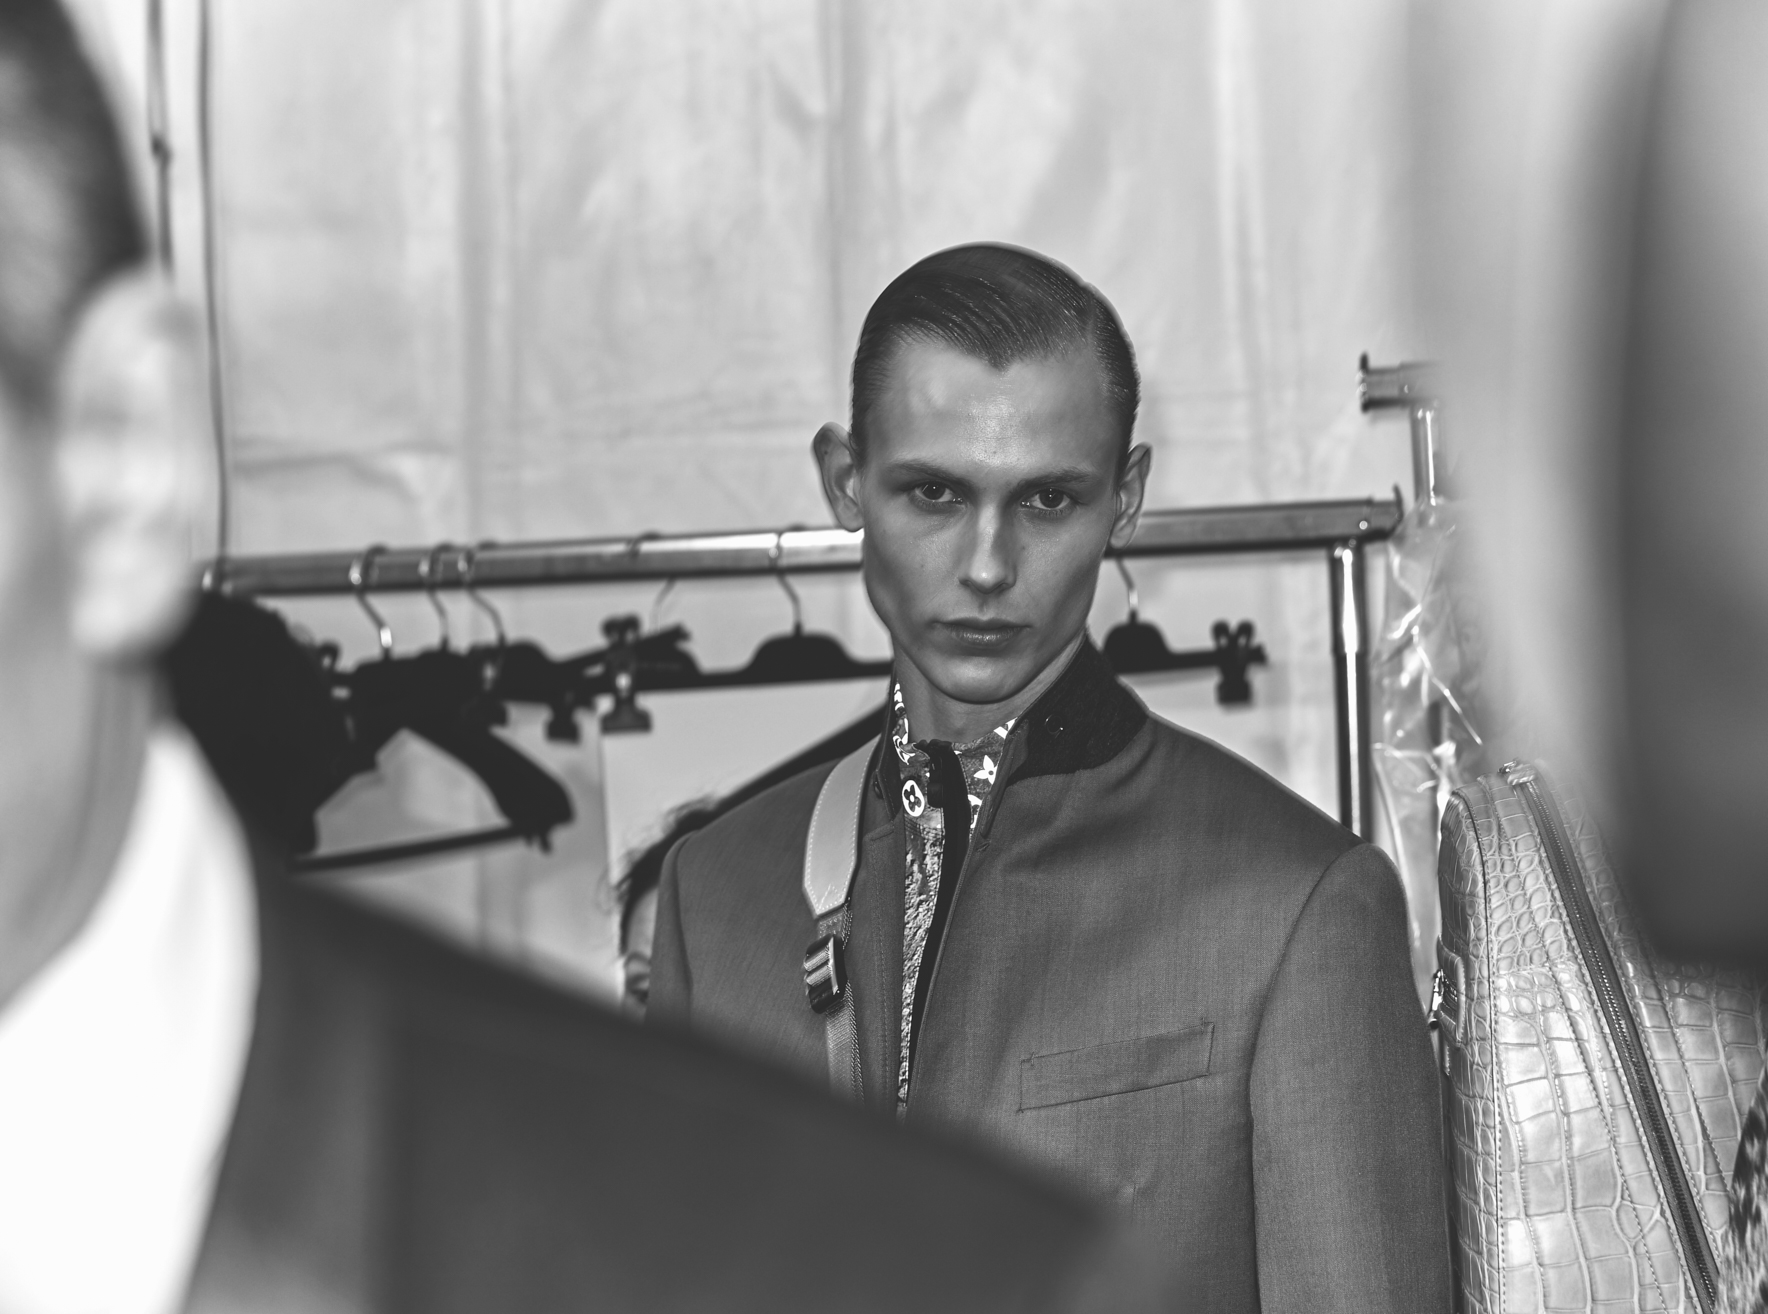 LOUIS VUITTON SS18 by Ruben de Wilde Behind The Blinds Magazine _ 51.jpg